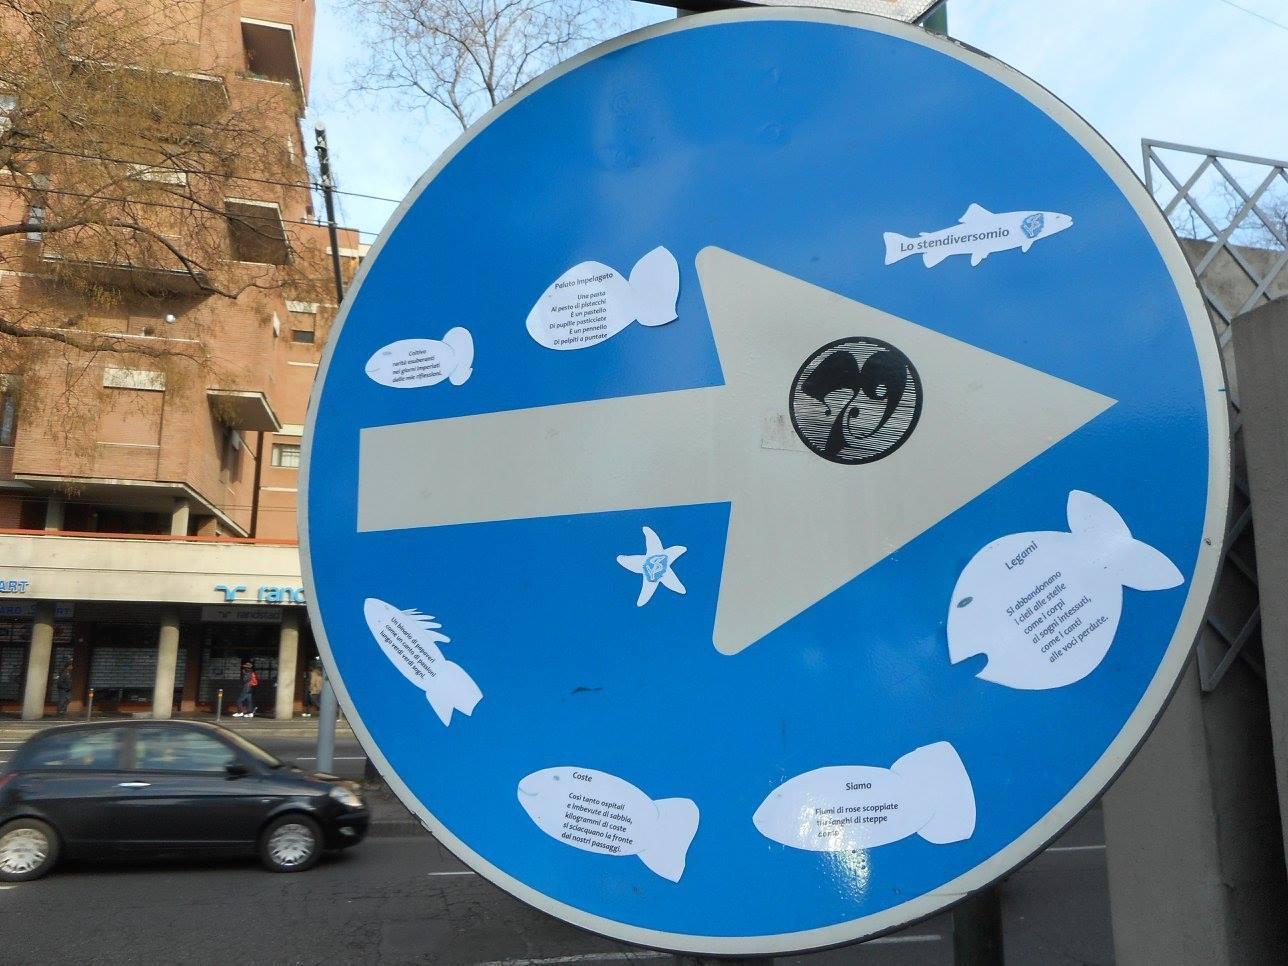 Acquario poetico o obbligo stradale